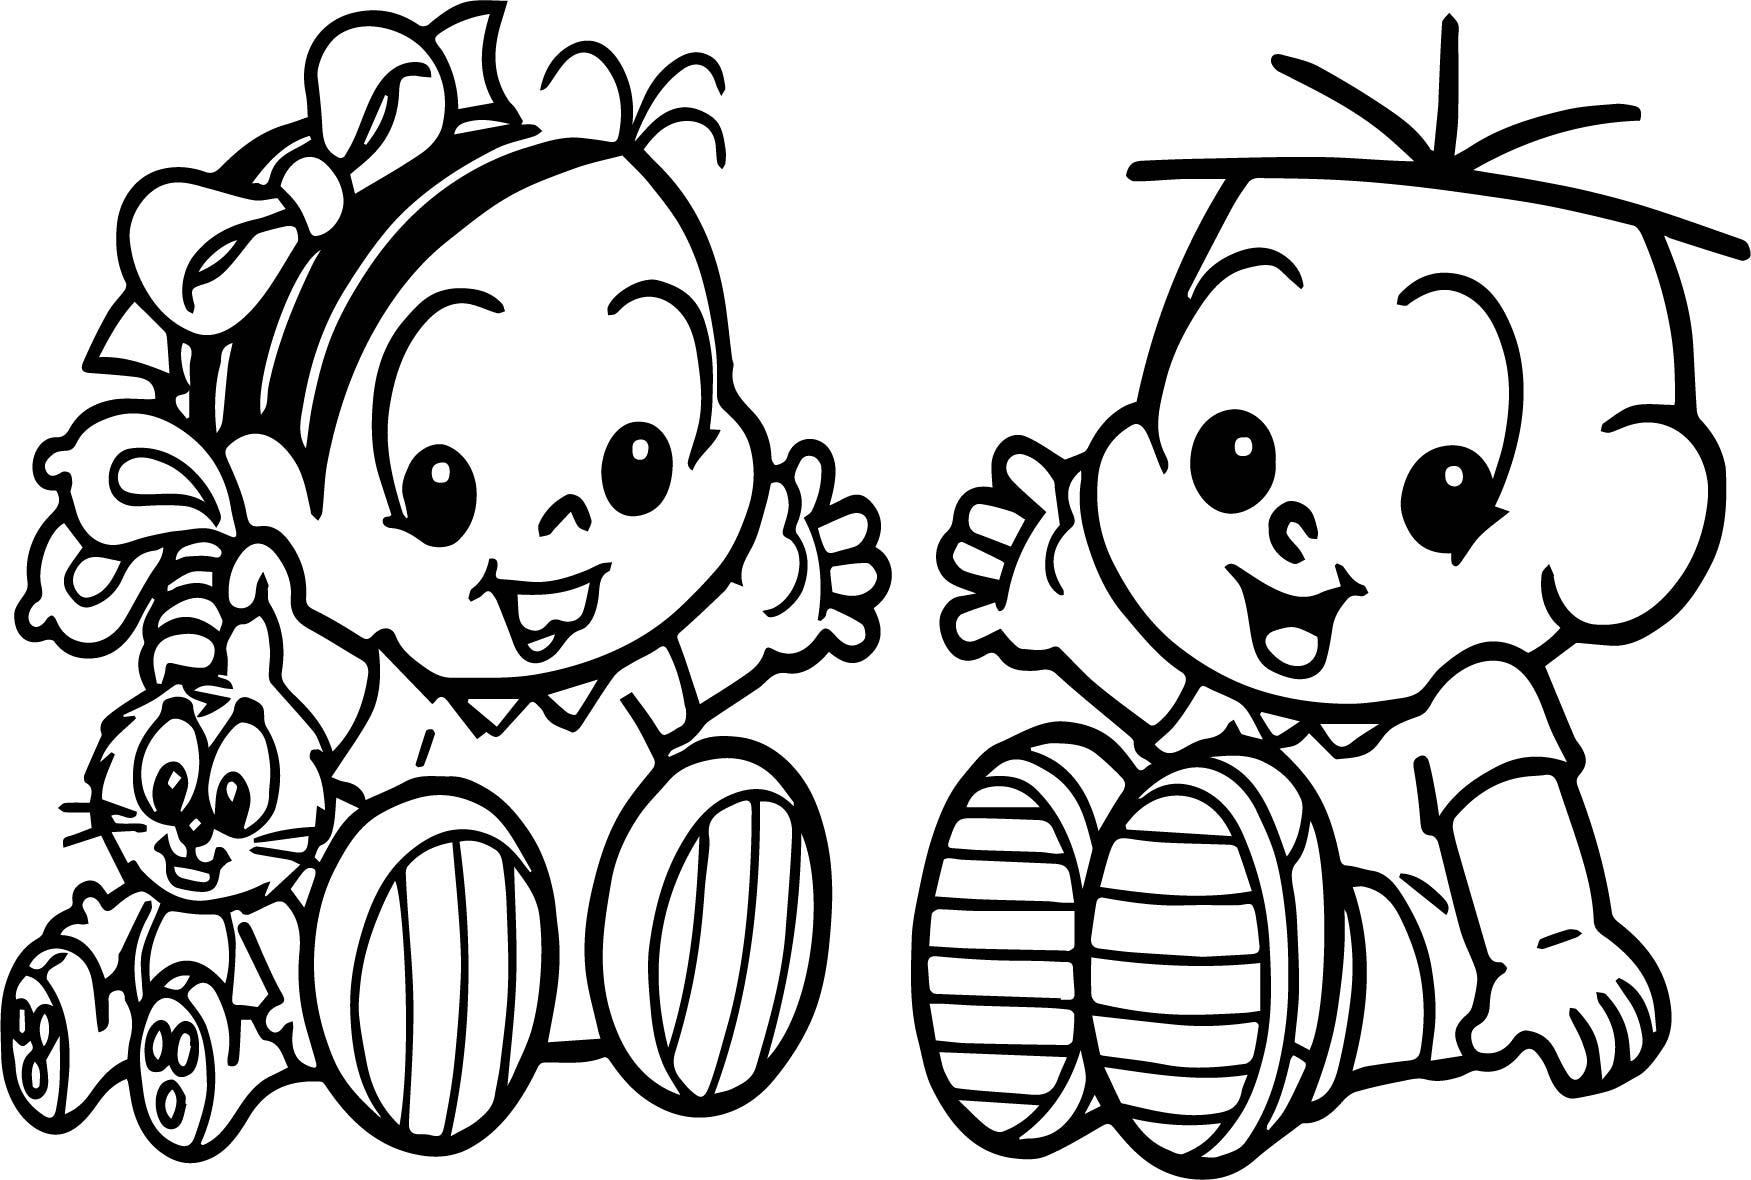 Baby Turma Da Monica Image Coloring Page